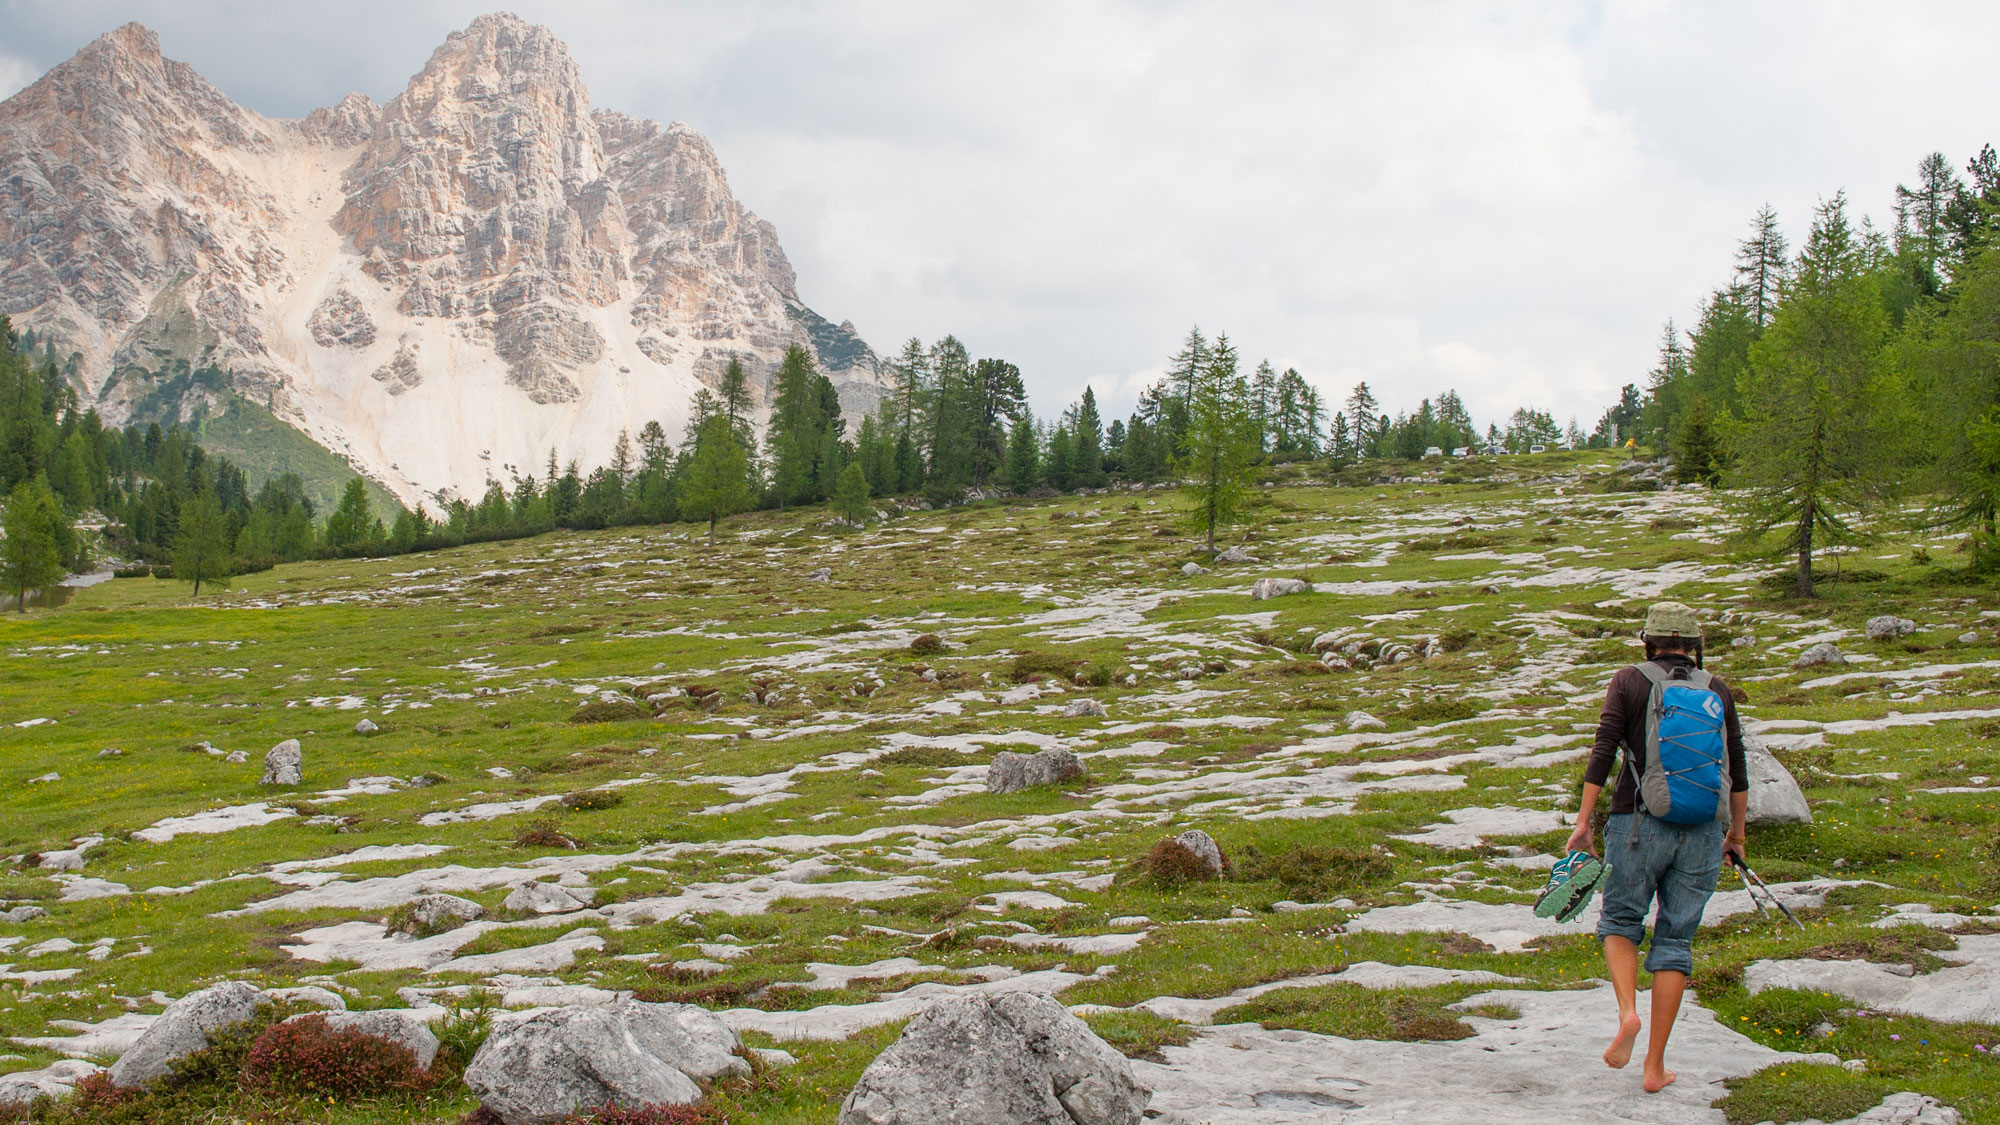 wp-content/uploads/itineraries/Dolomites/dolomites-hiking-6.jpg